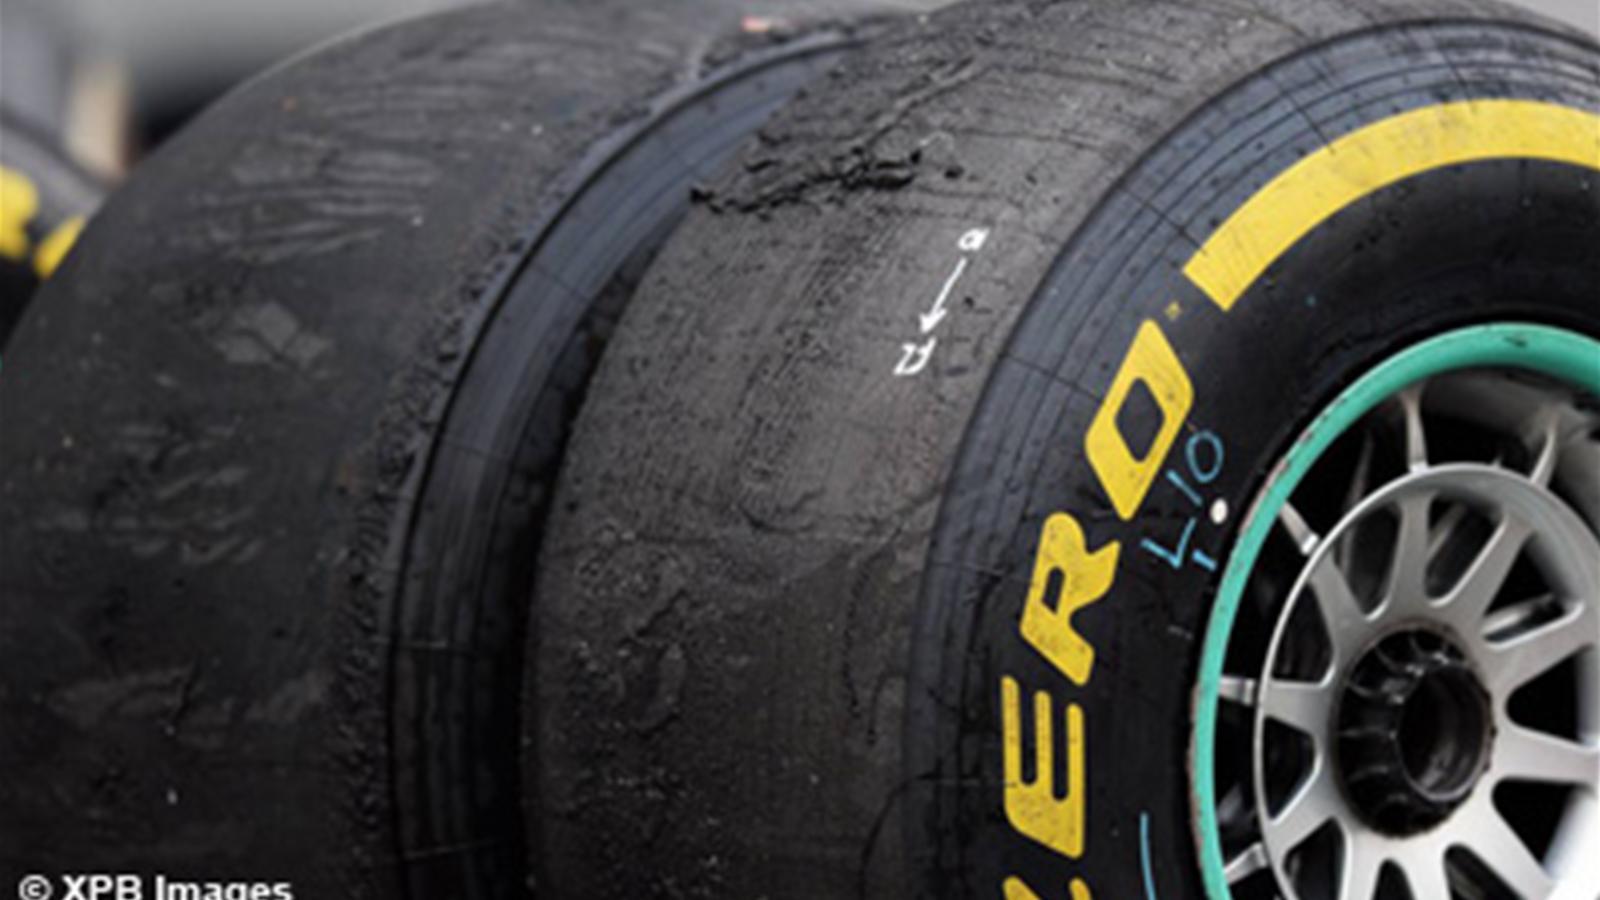 pirelli menace de ne pas fournir de pneus pour 2014 saison 2014 formule 1 eurosport. Black Bedroom Furniture Sets. Home Design Ideas